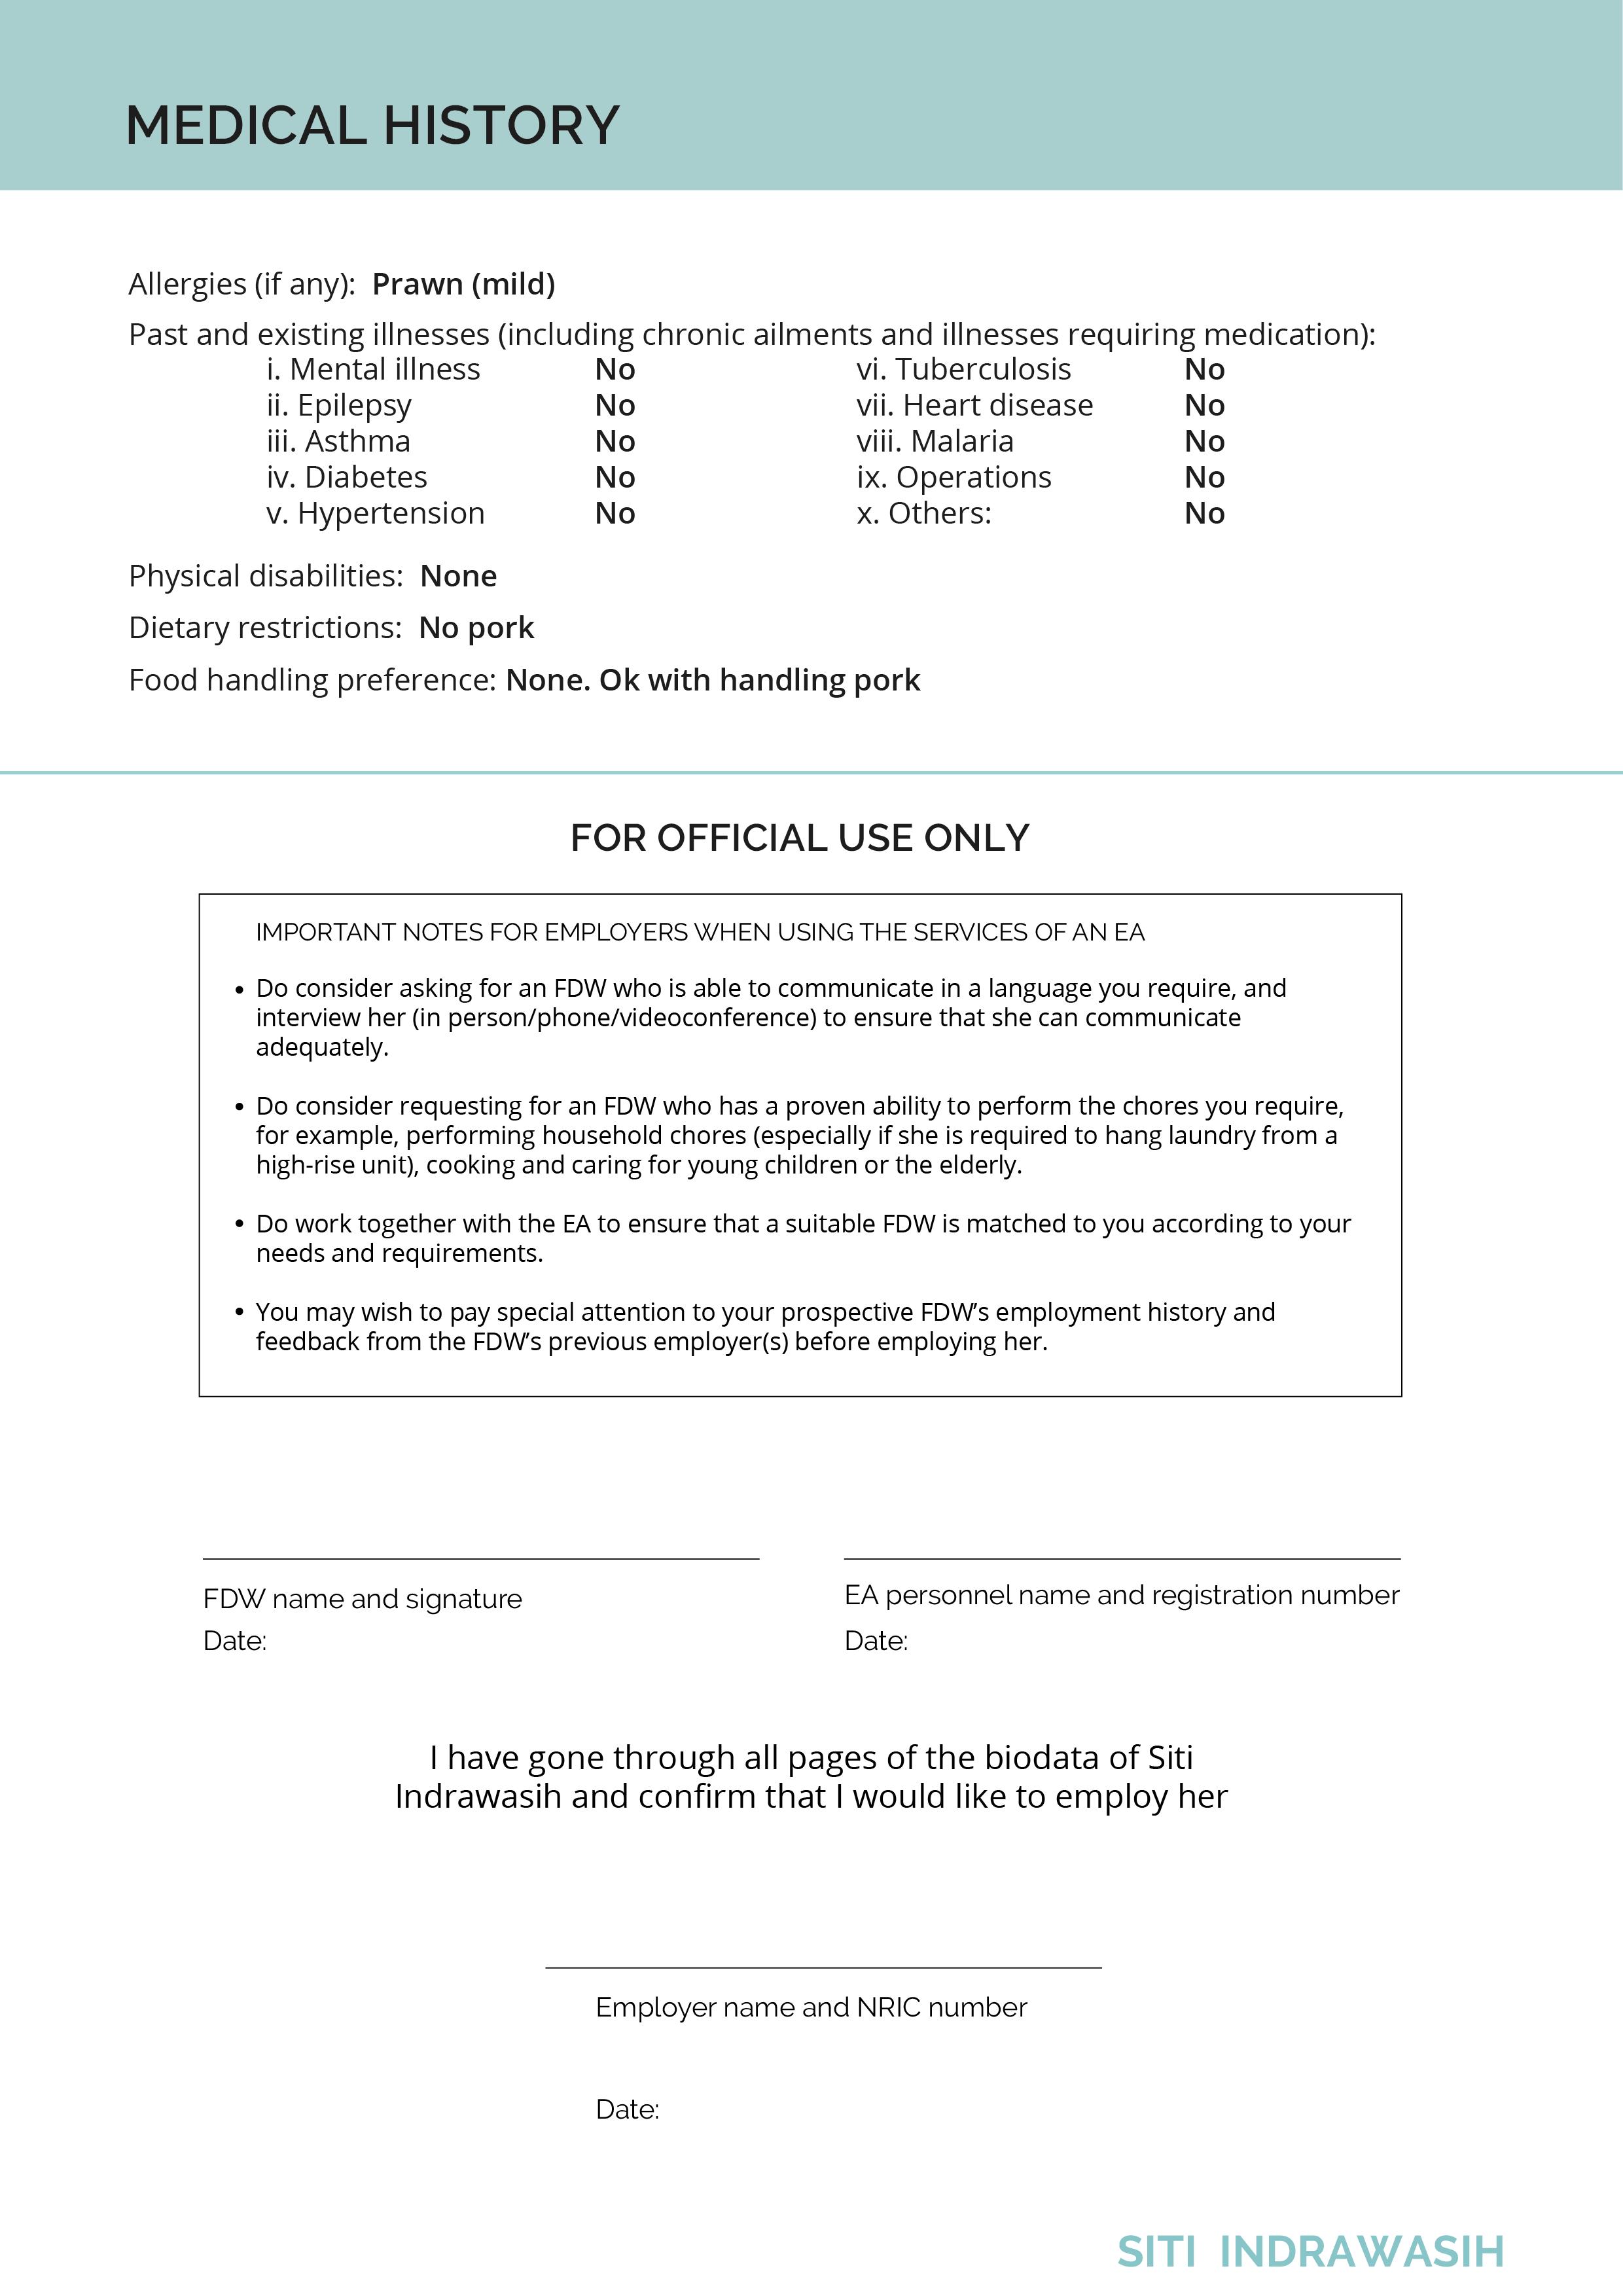 Biodata-06.png